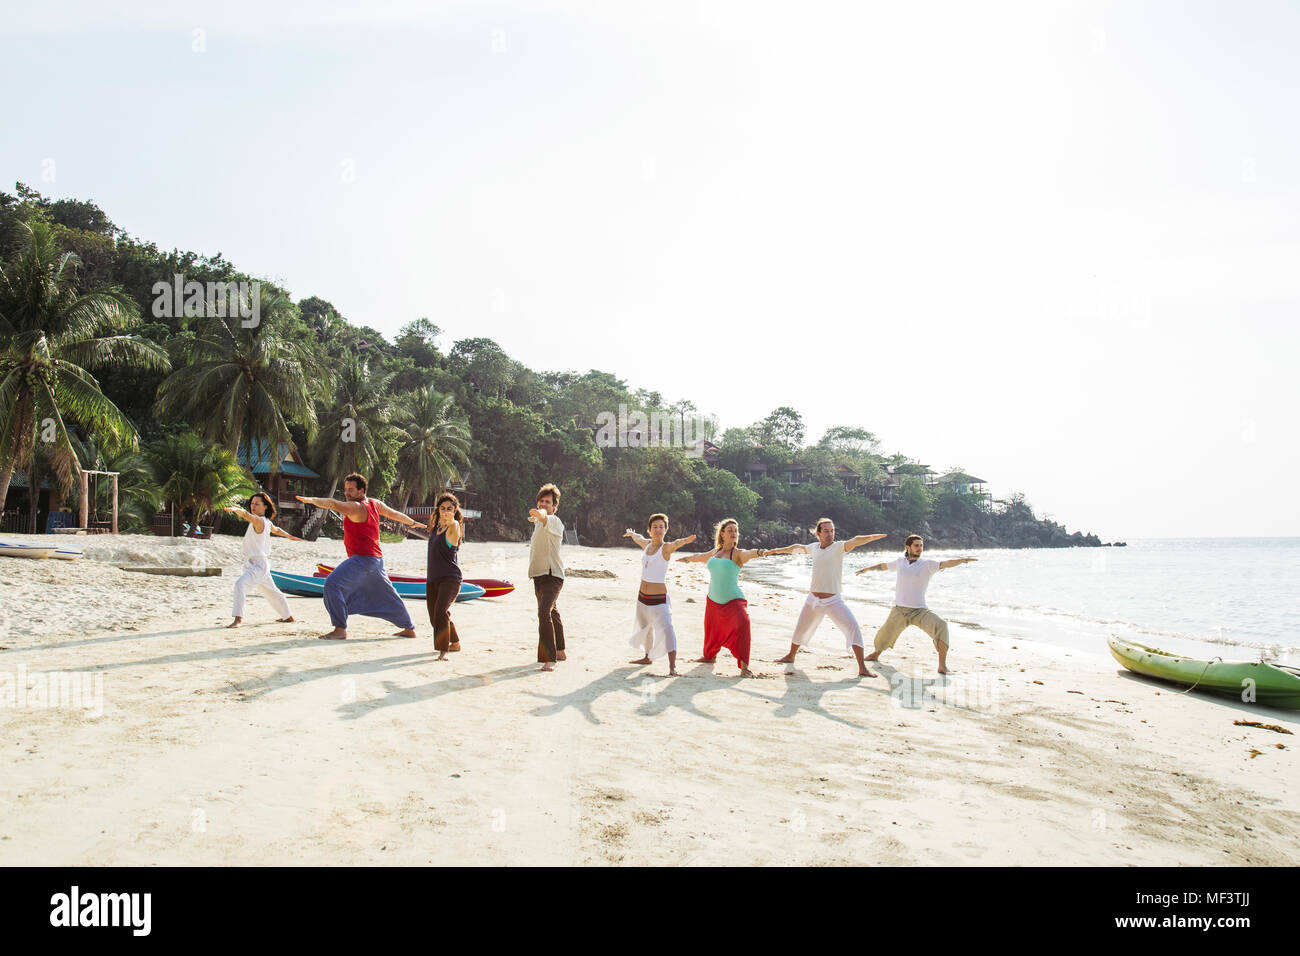 Thailand, Koh Phangan, group of people doing yoga on a beach - Stock Image